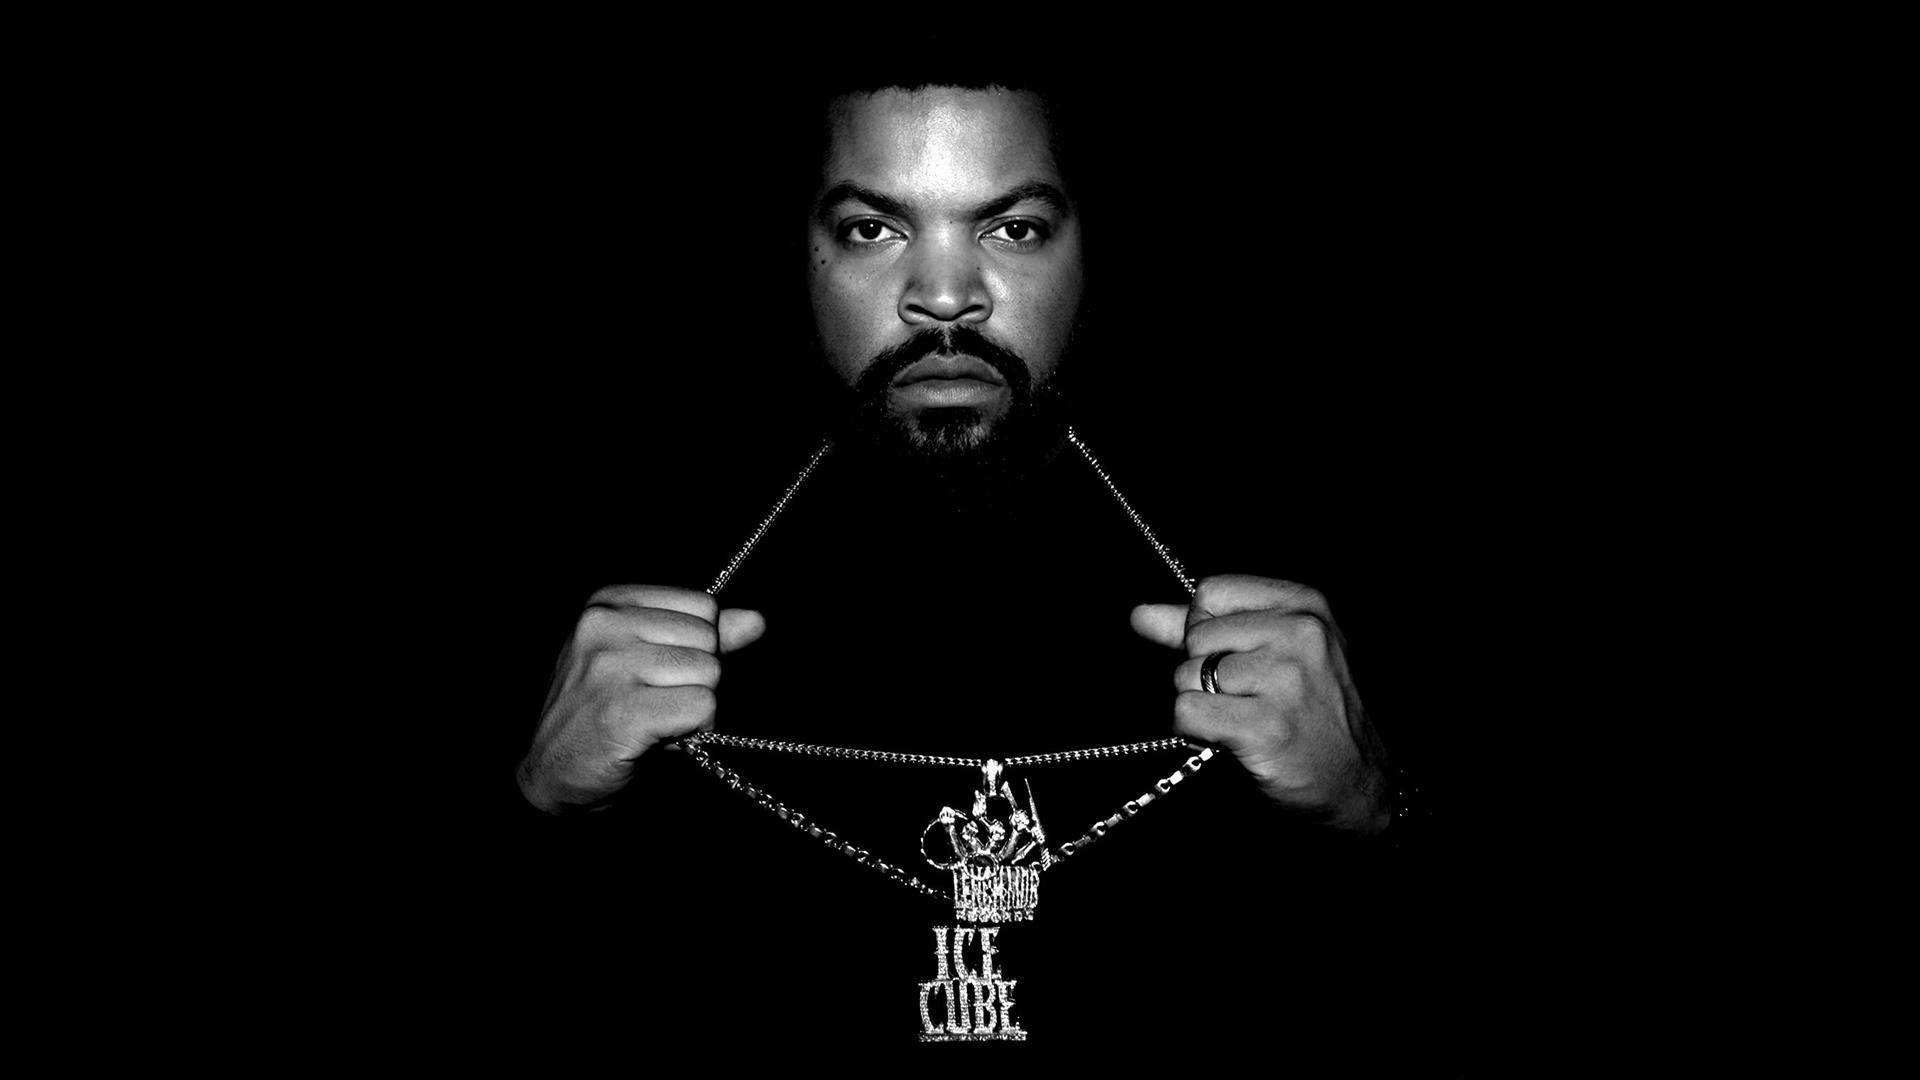 Music   Ice Cube Wallpaper 1920x1080